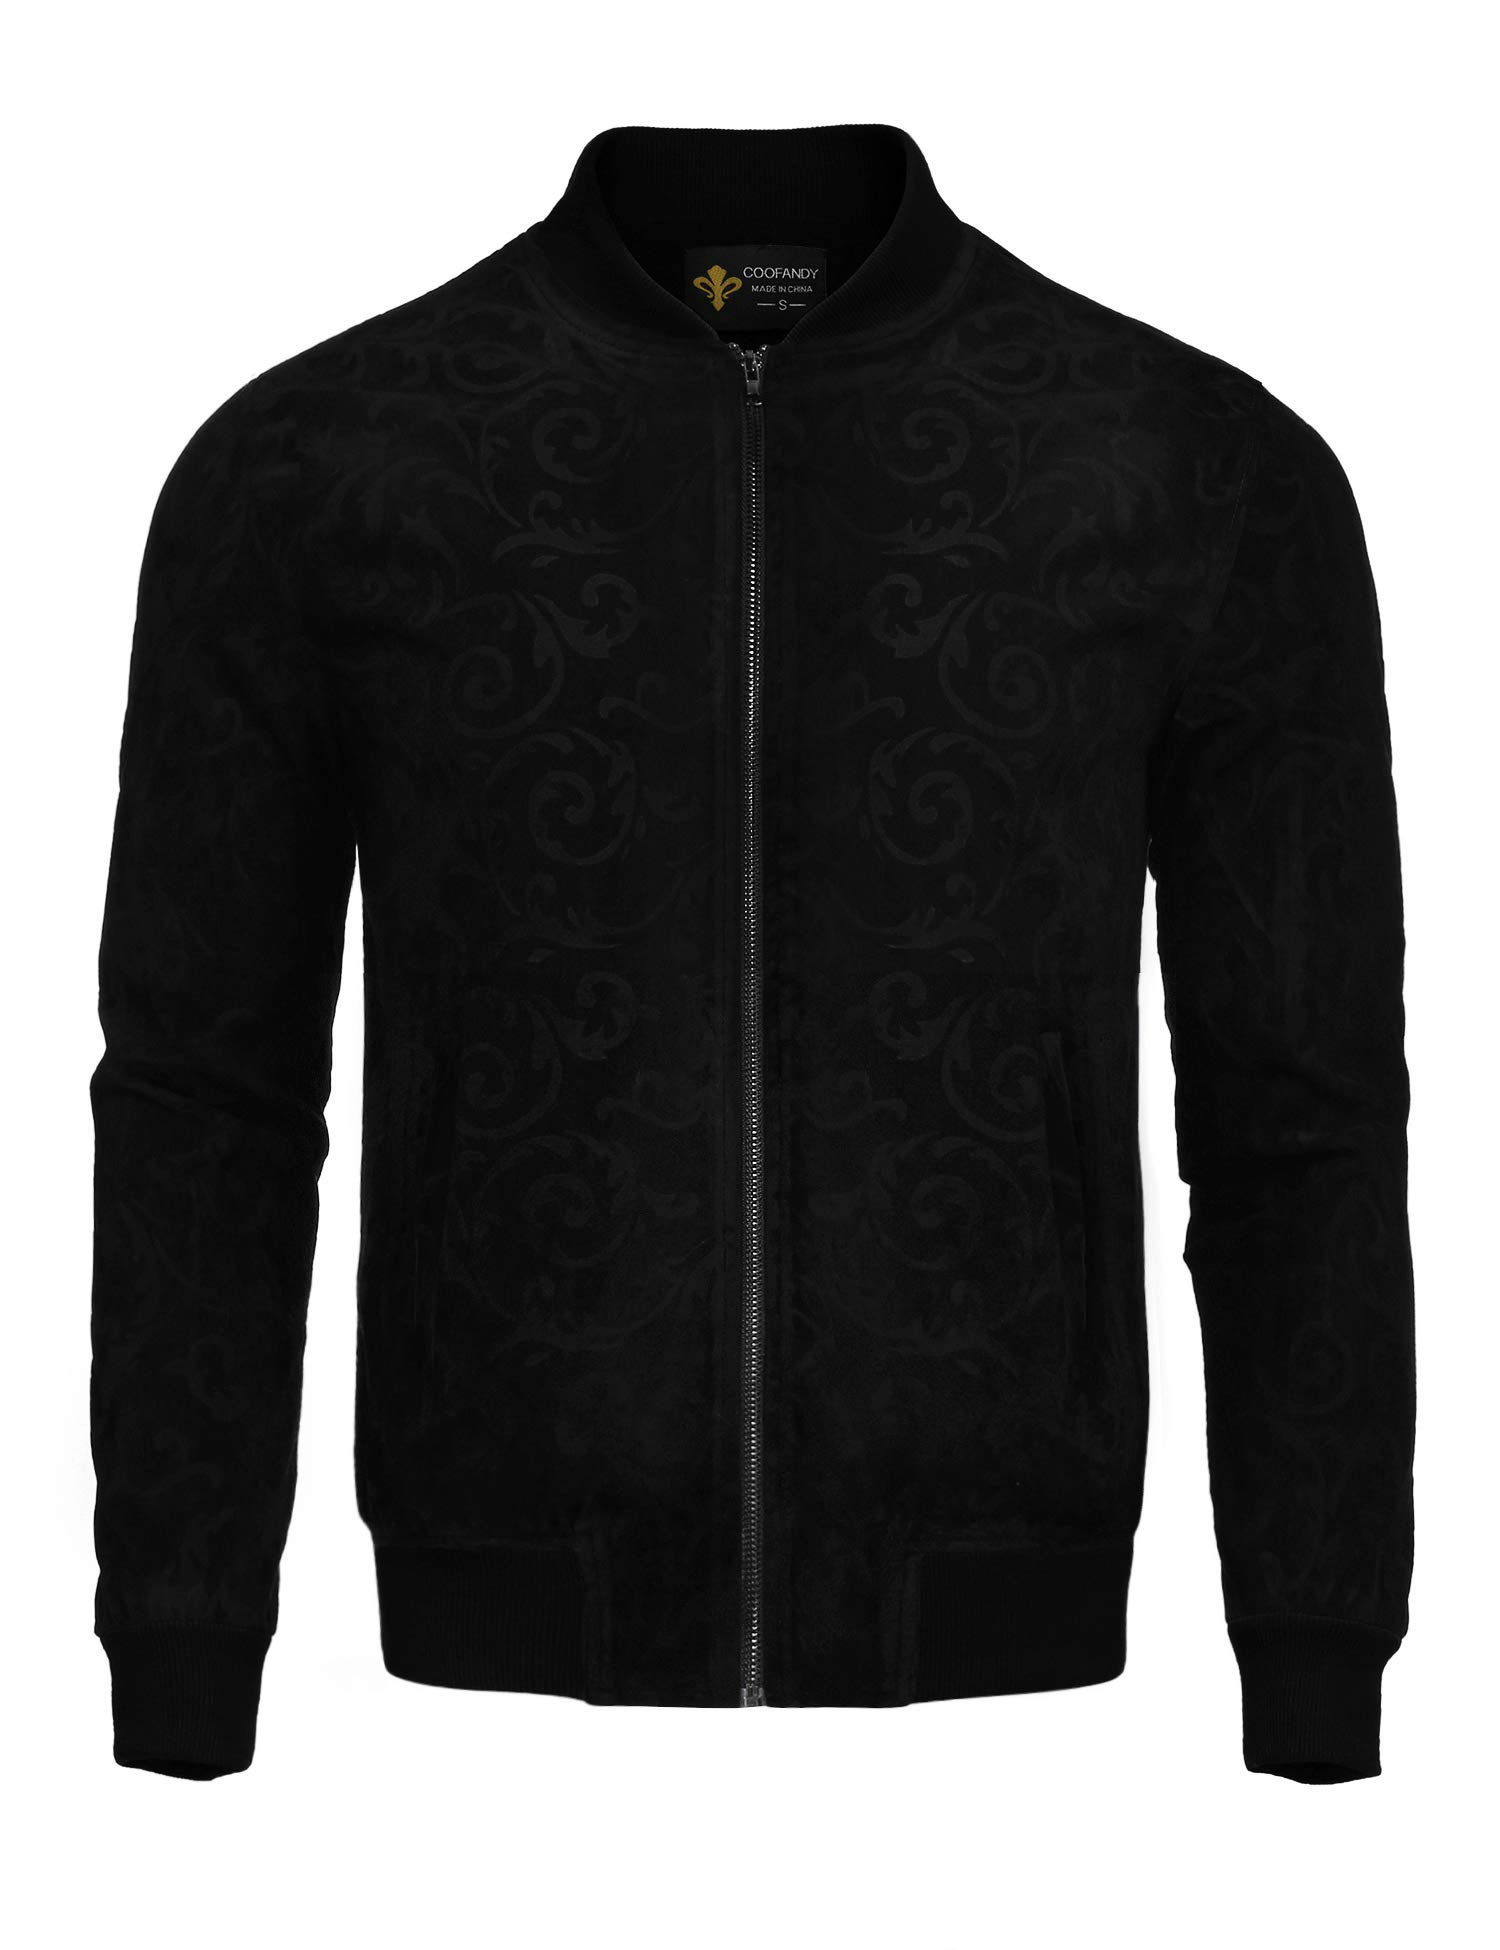 COOFANDY Men's Floral Suede Bomber Leather Jacket Casual Varsity Baseball Coat,Black,Medium